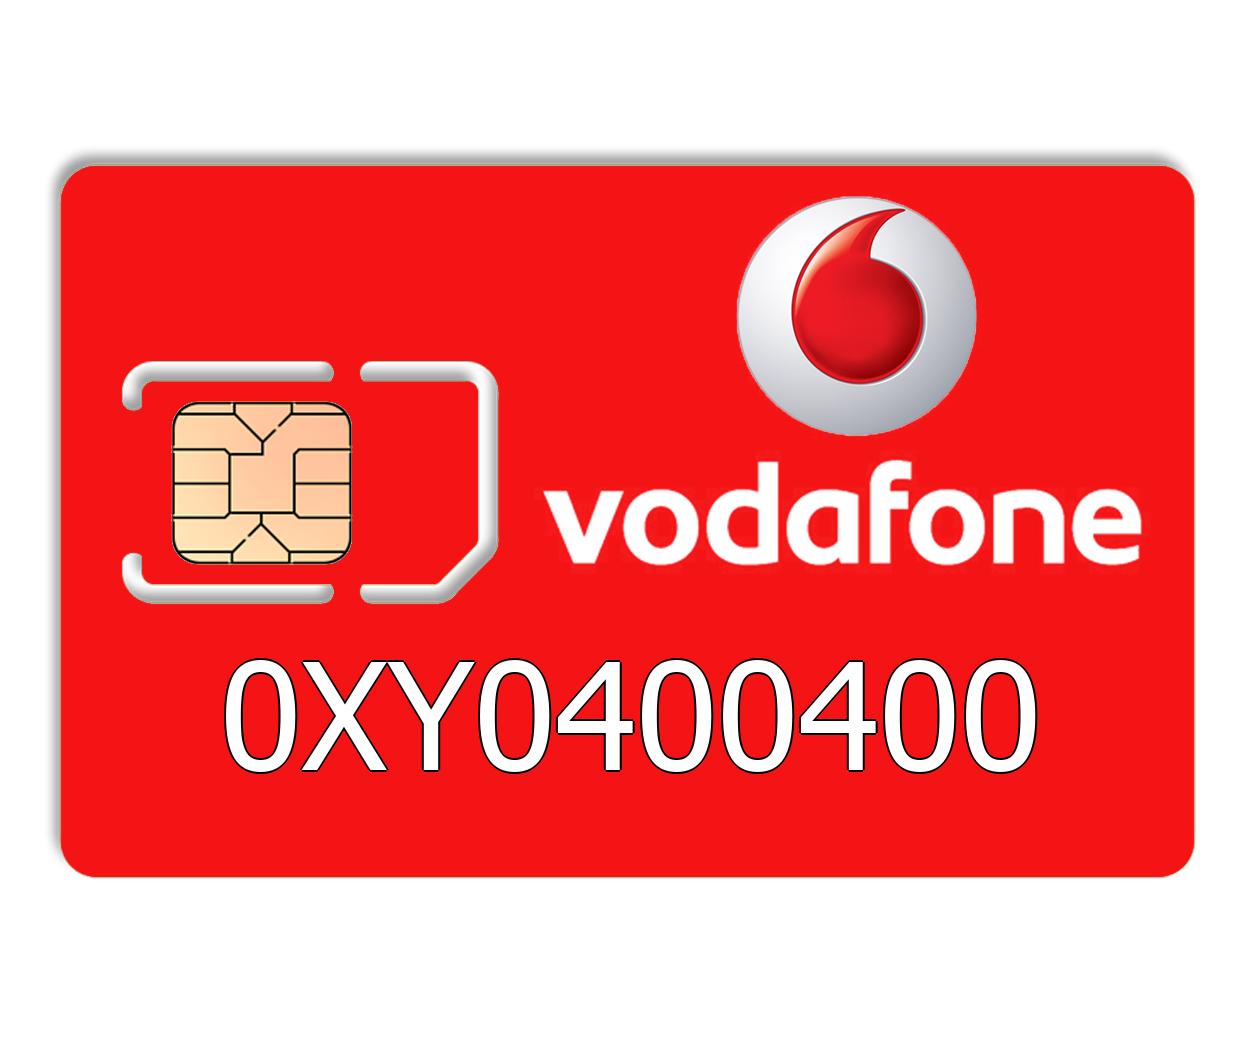 Красивый номер Vodafone 0XY0400400